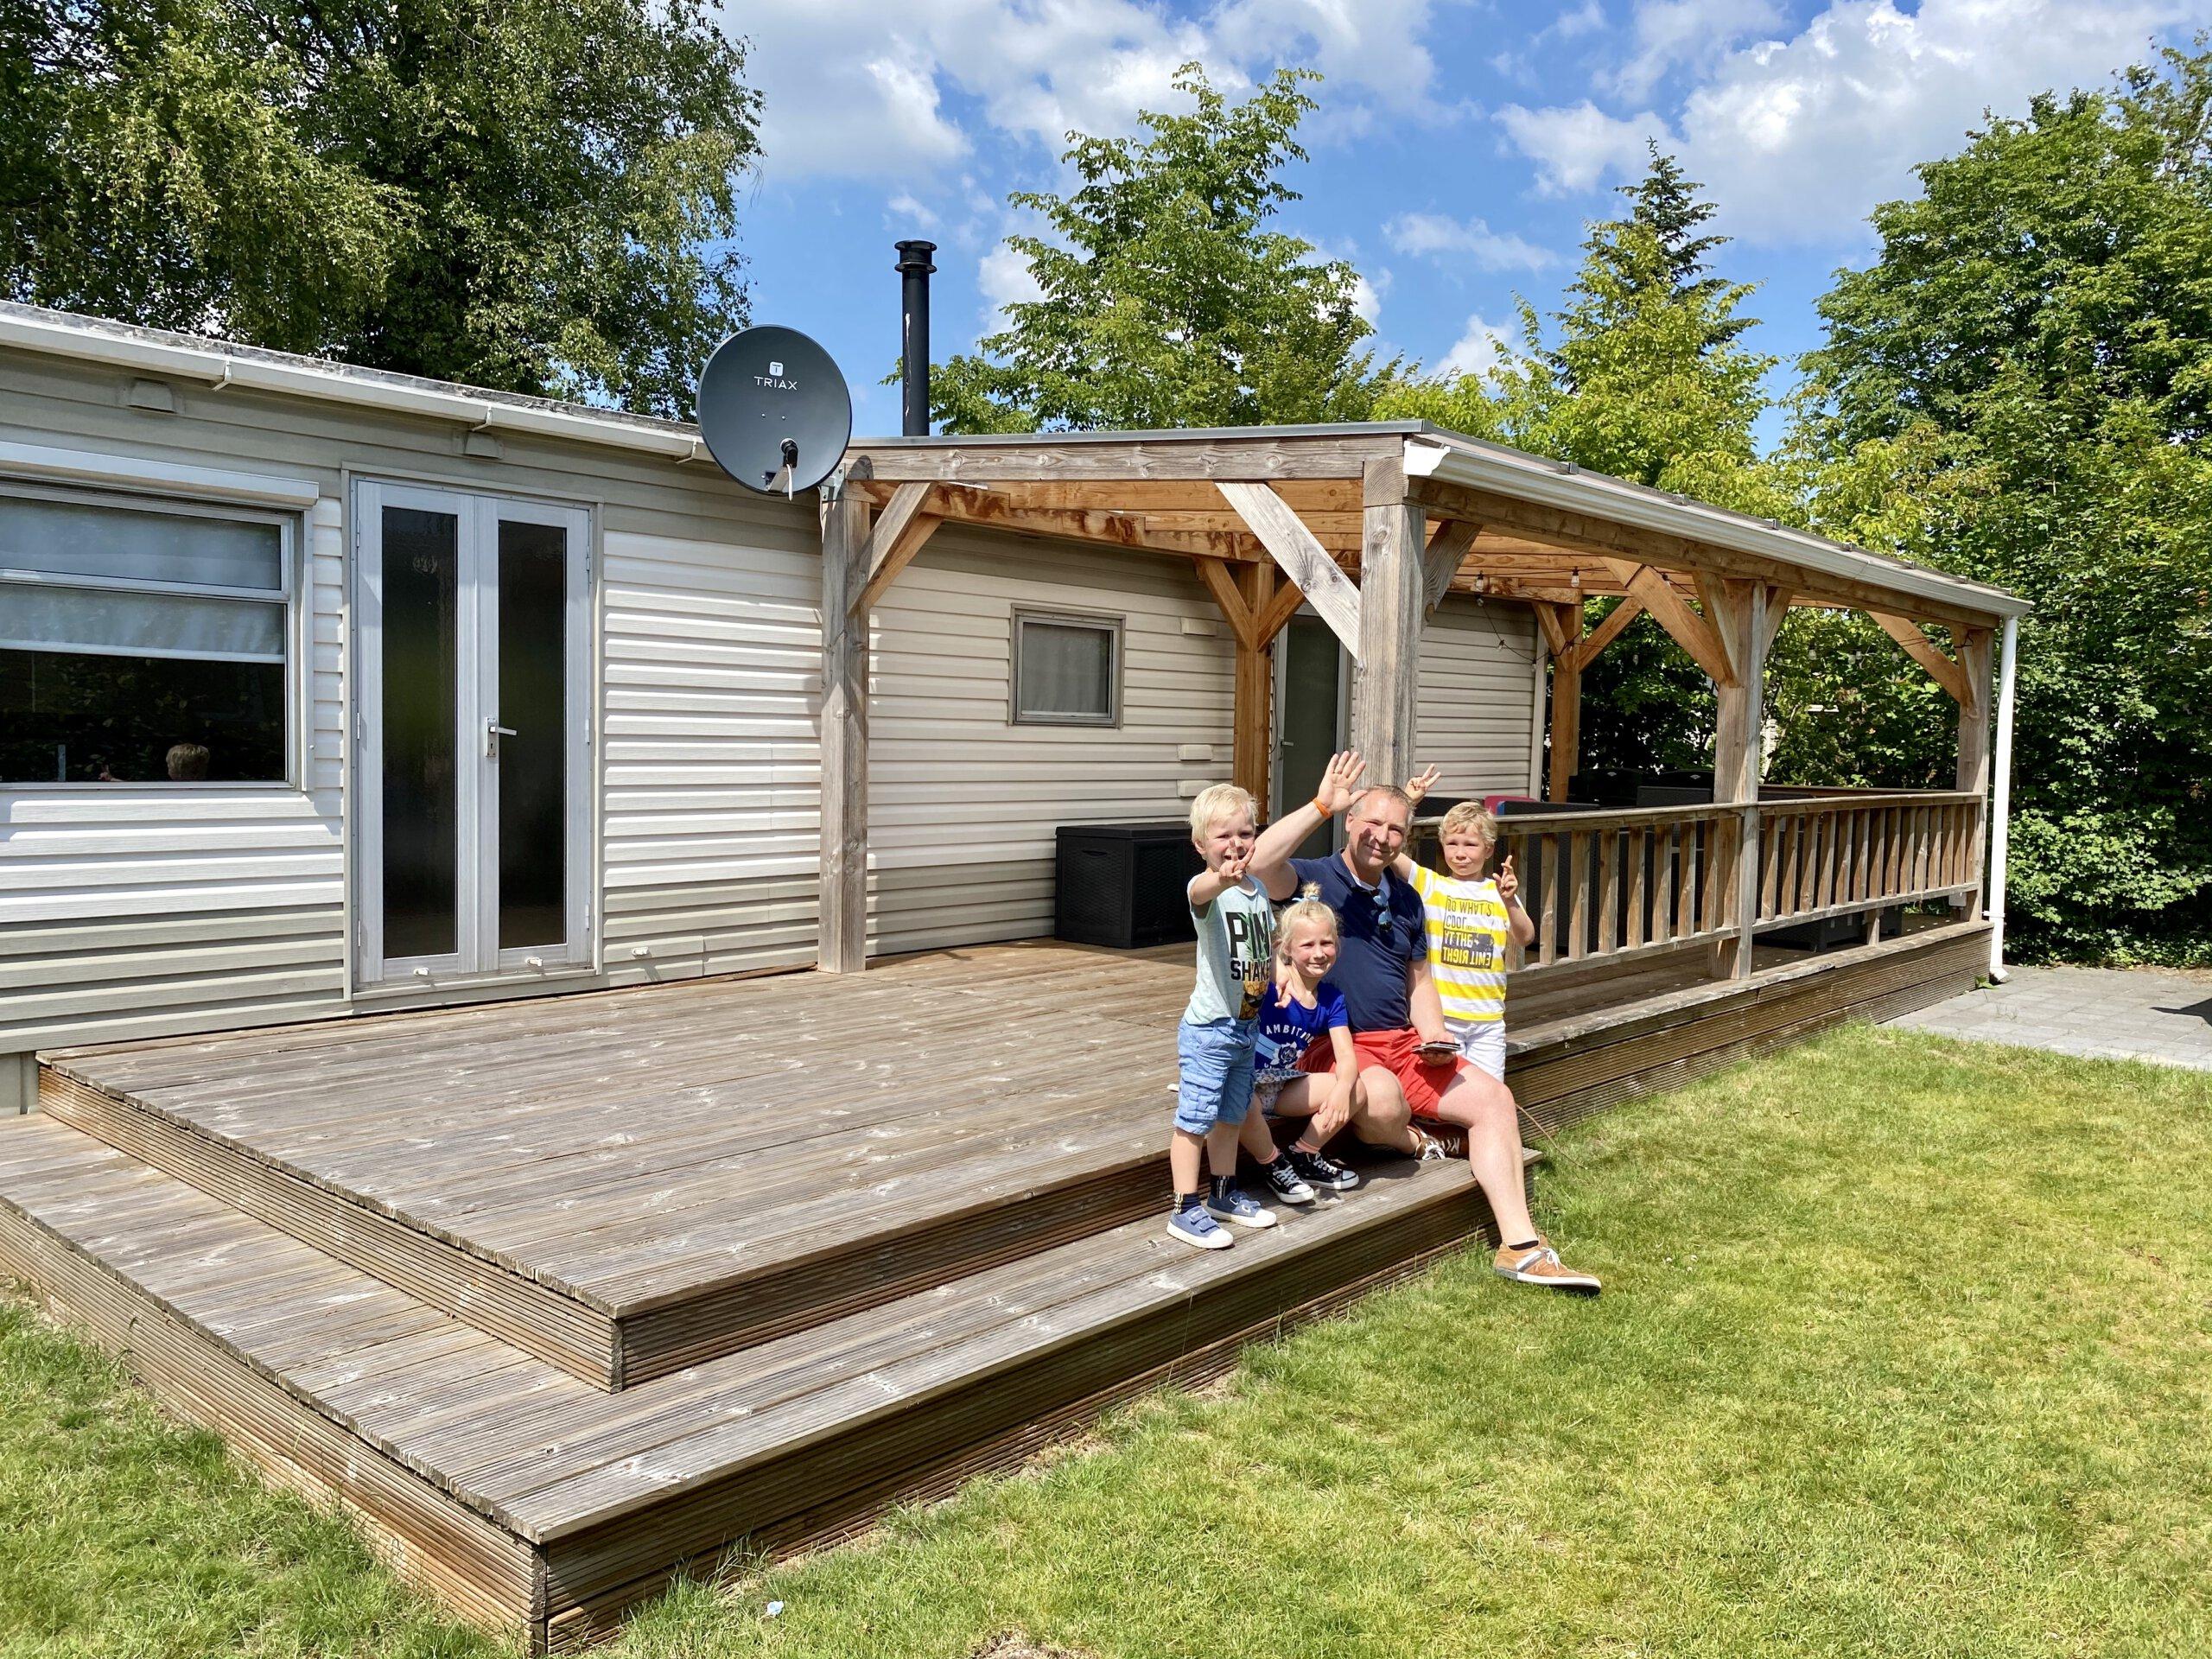 camping, sprookjescamping, vakantiehuisje, chalet, mobilehome